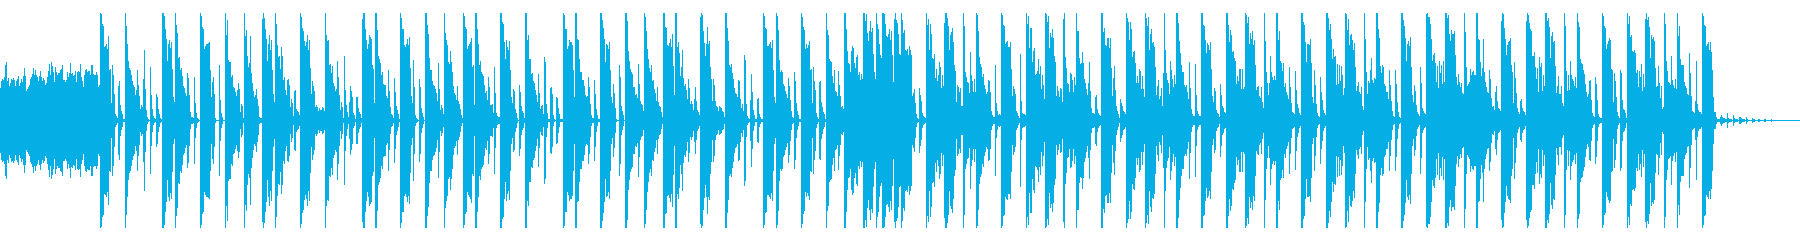 146 BPMの再生済みの波形